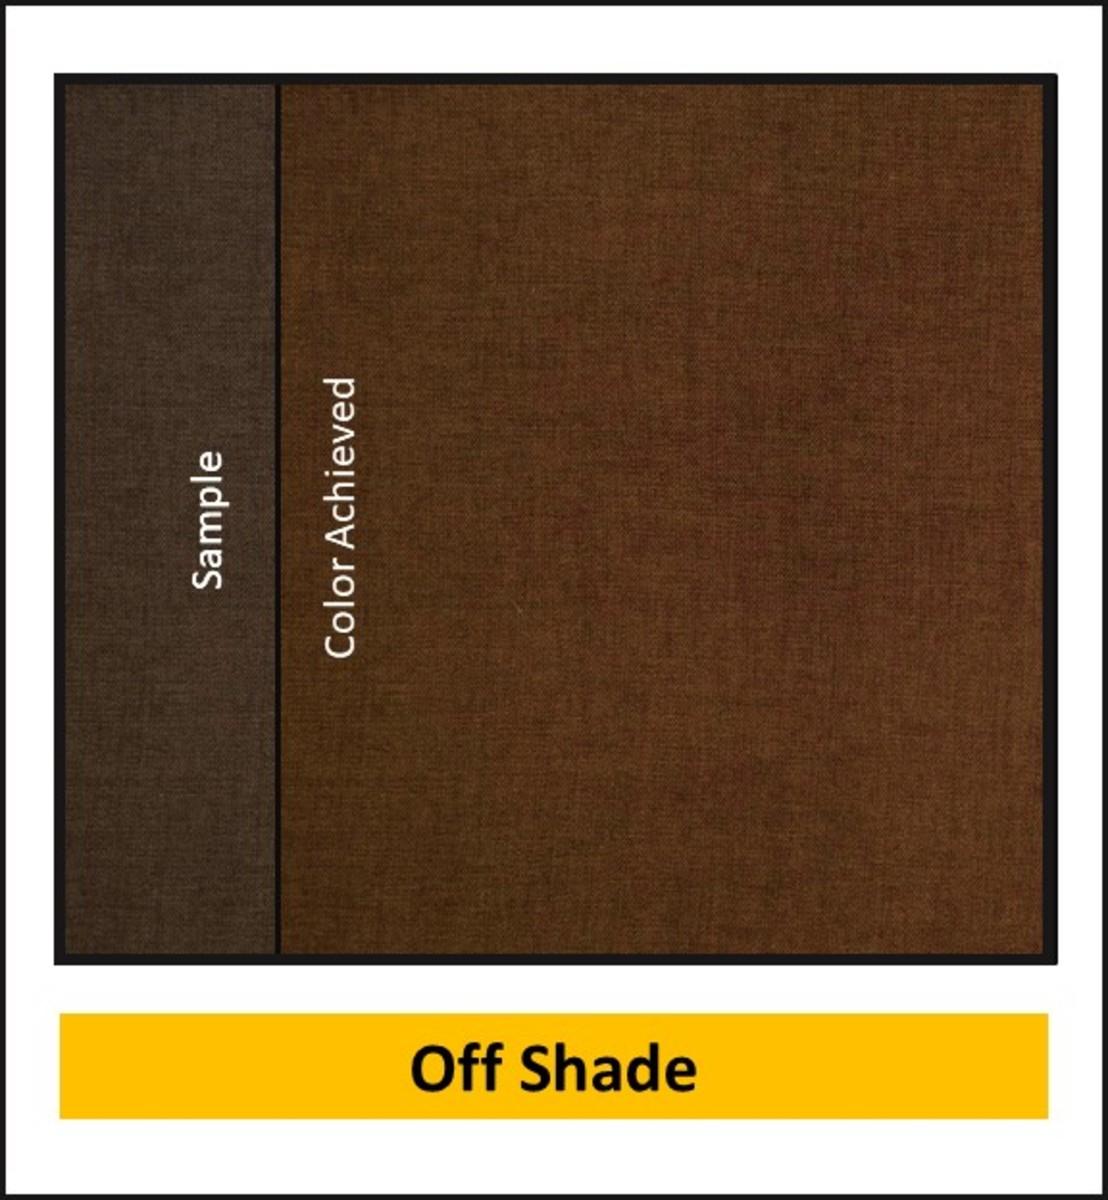 Off Shade